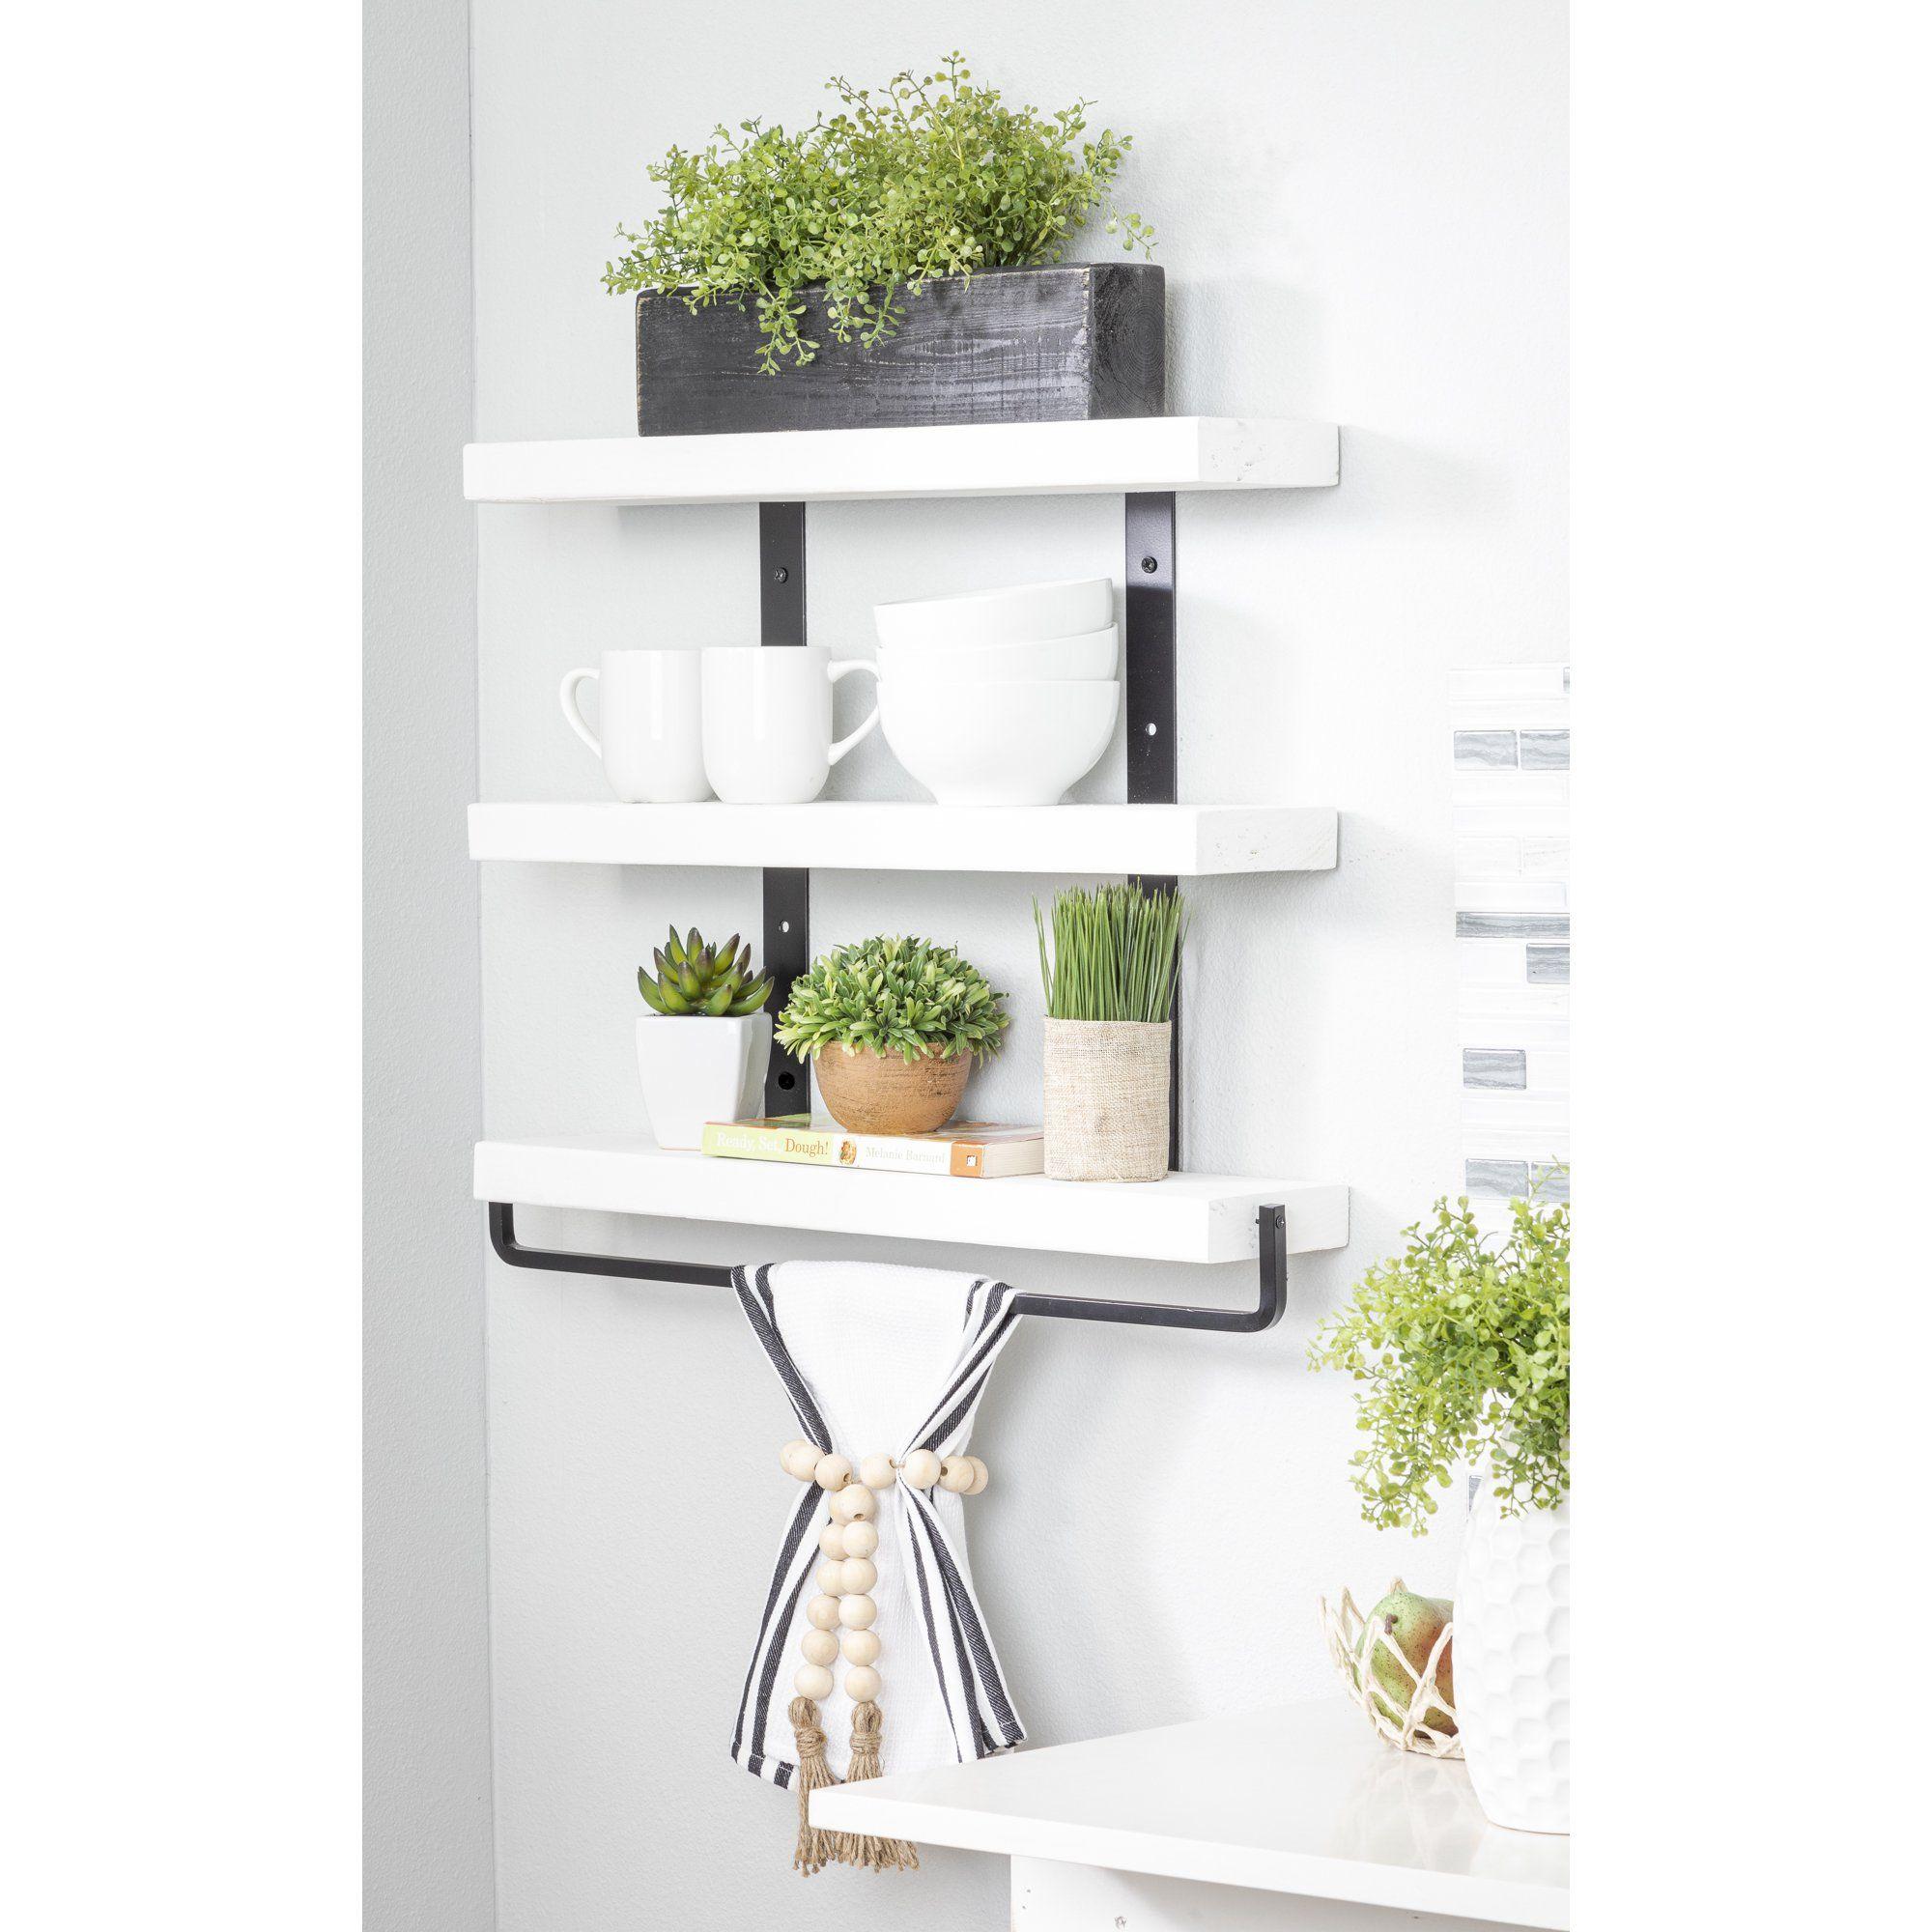 Del Hutson Designs White 24inch Industrial 3 Tier Floating Shelf With Towel Walmart Com In 2021 Bathroom Shelf Decor Floating Shelves Floating Wall Shelves 24 inch white floating shelf